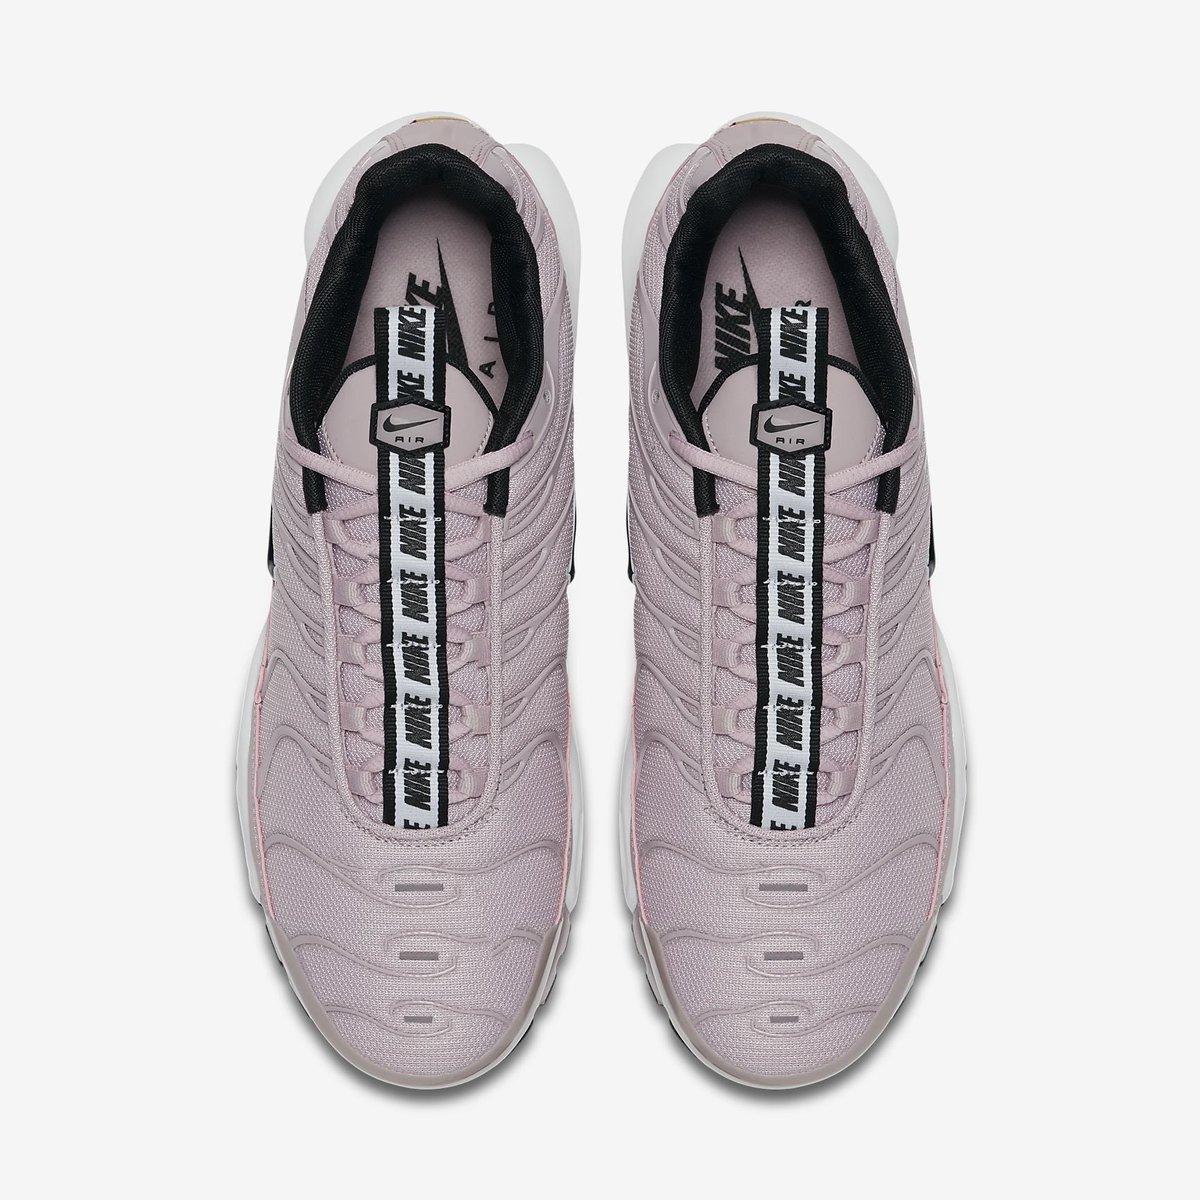 premium selection ea4d2 3960d Sneaker Deals GB on Twitter